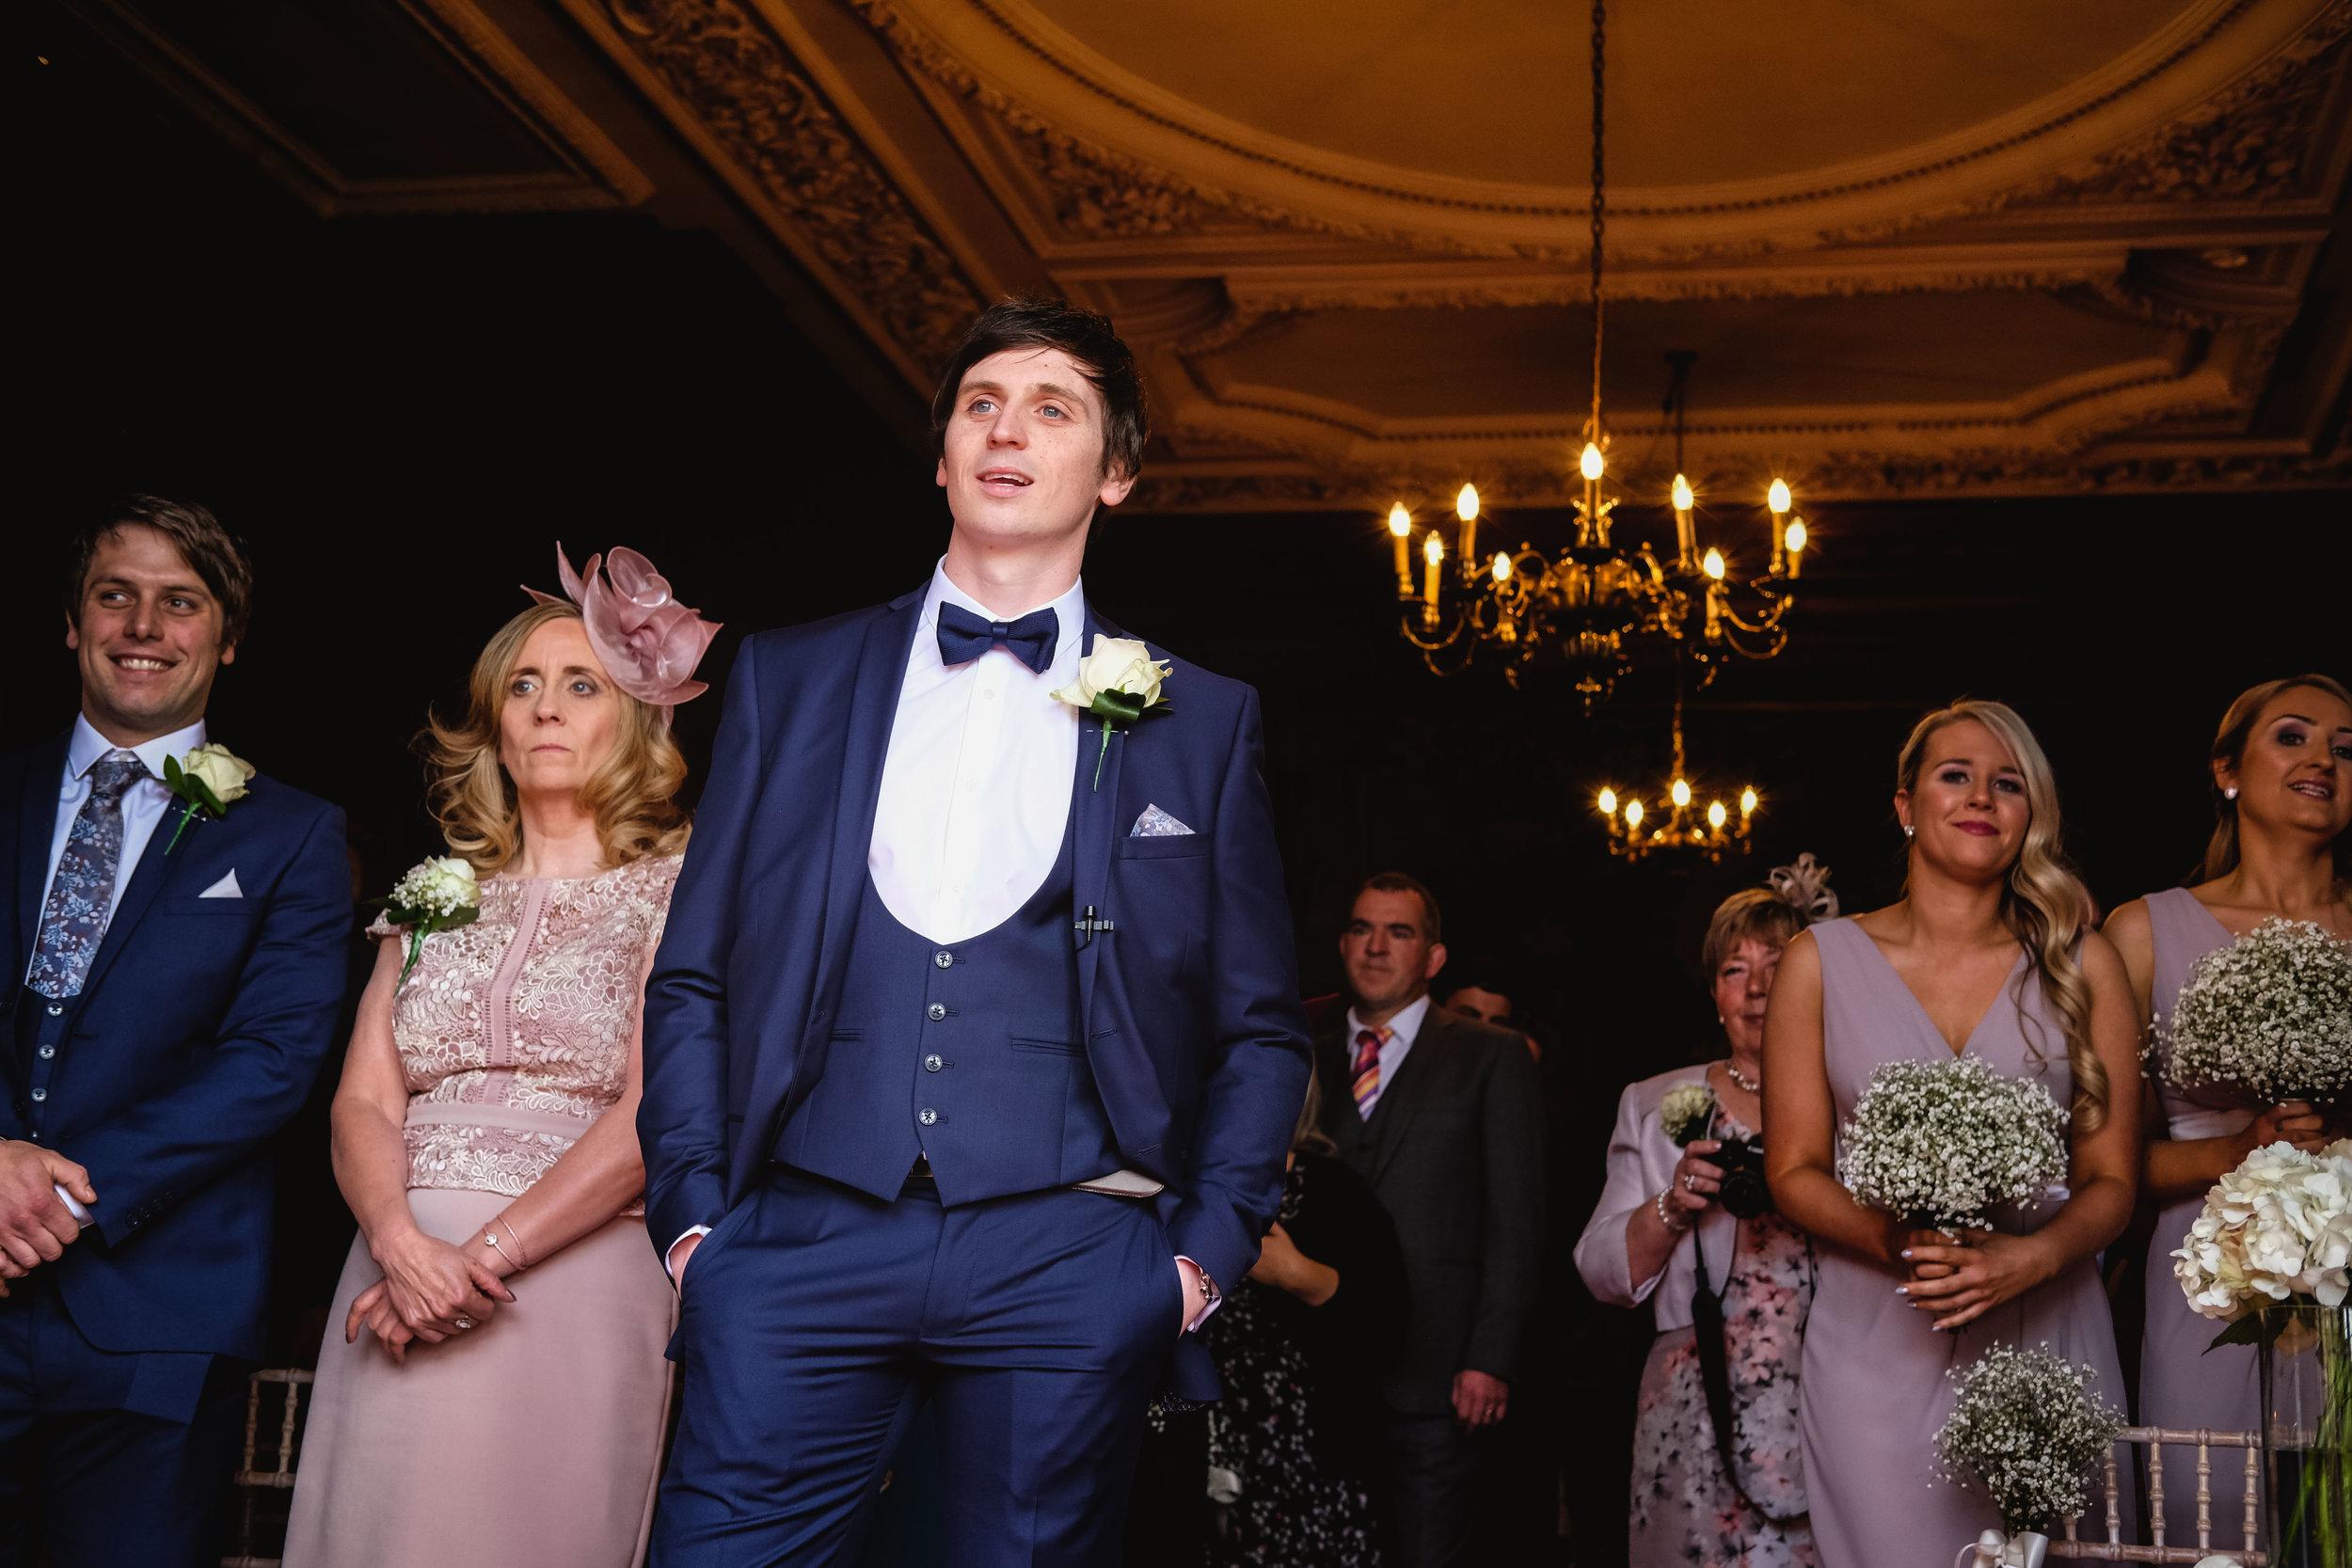 Thornton manor wedding photography cheshire wedding photographer liverpool manchester warrington chester wirral wedding BLOG (33 of 108).jpg